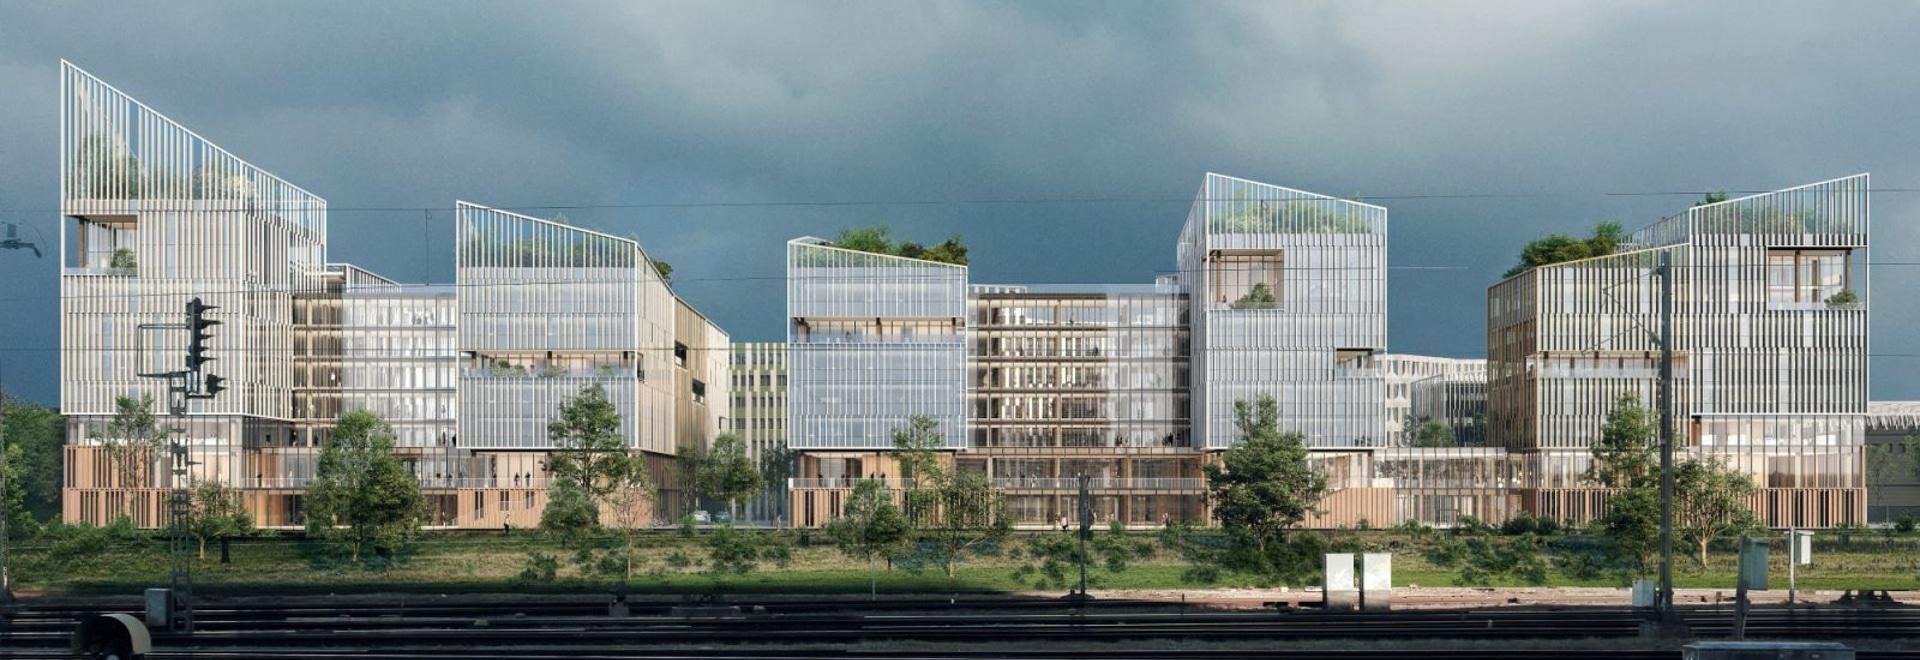 Henning Larsen's winning design for workspace inspired by rural French villages